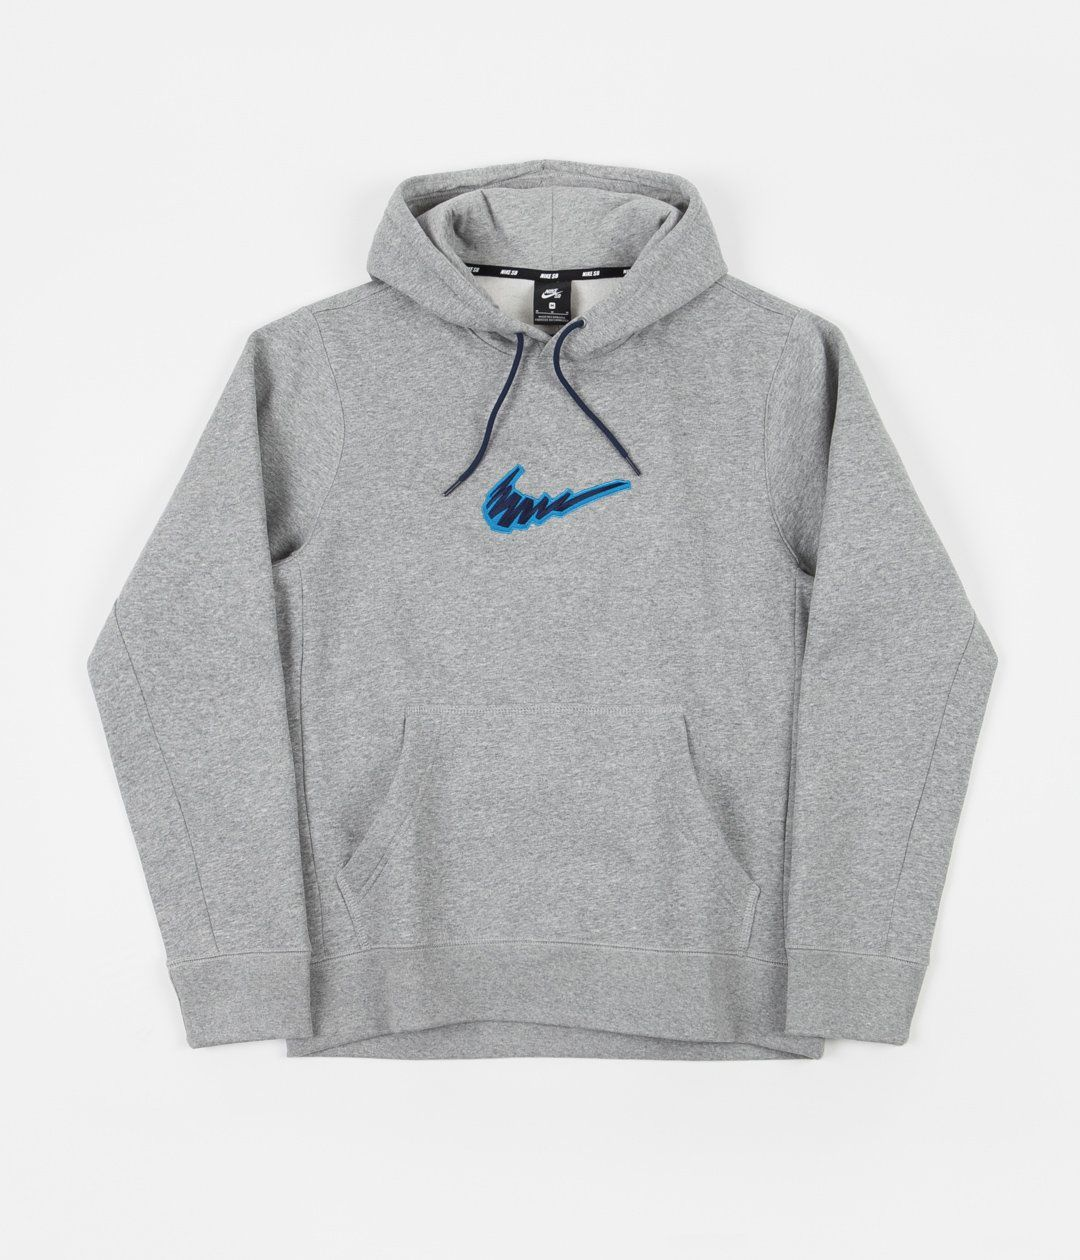 Nike Sb Truck Fleece Hoodie Dark Grey Heather Laser Blue Fleece Hoodie Hoodies Nike Sb [ 1260 x 1080 Pixel ]